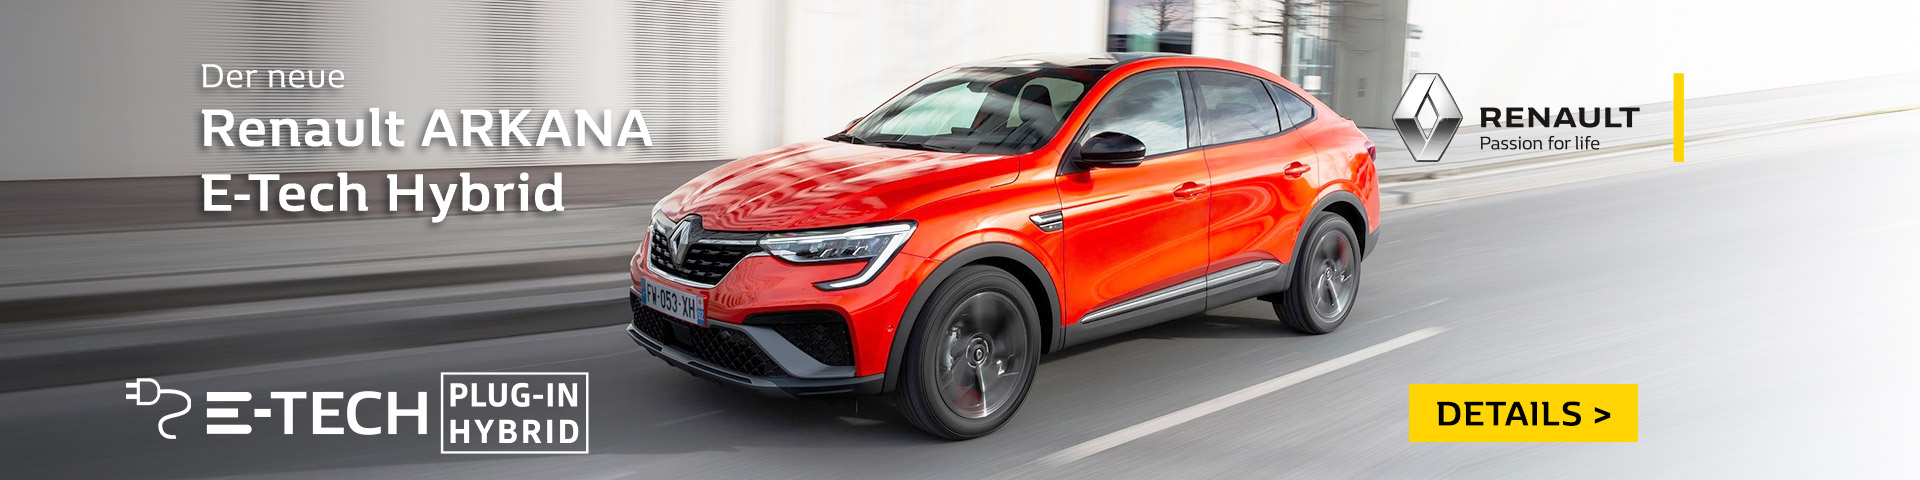 Renault Arkana als E-Tech Hybrid bei Autohaus P&A Preckel